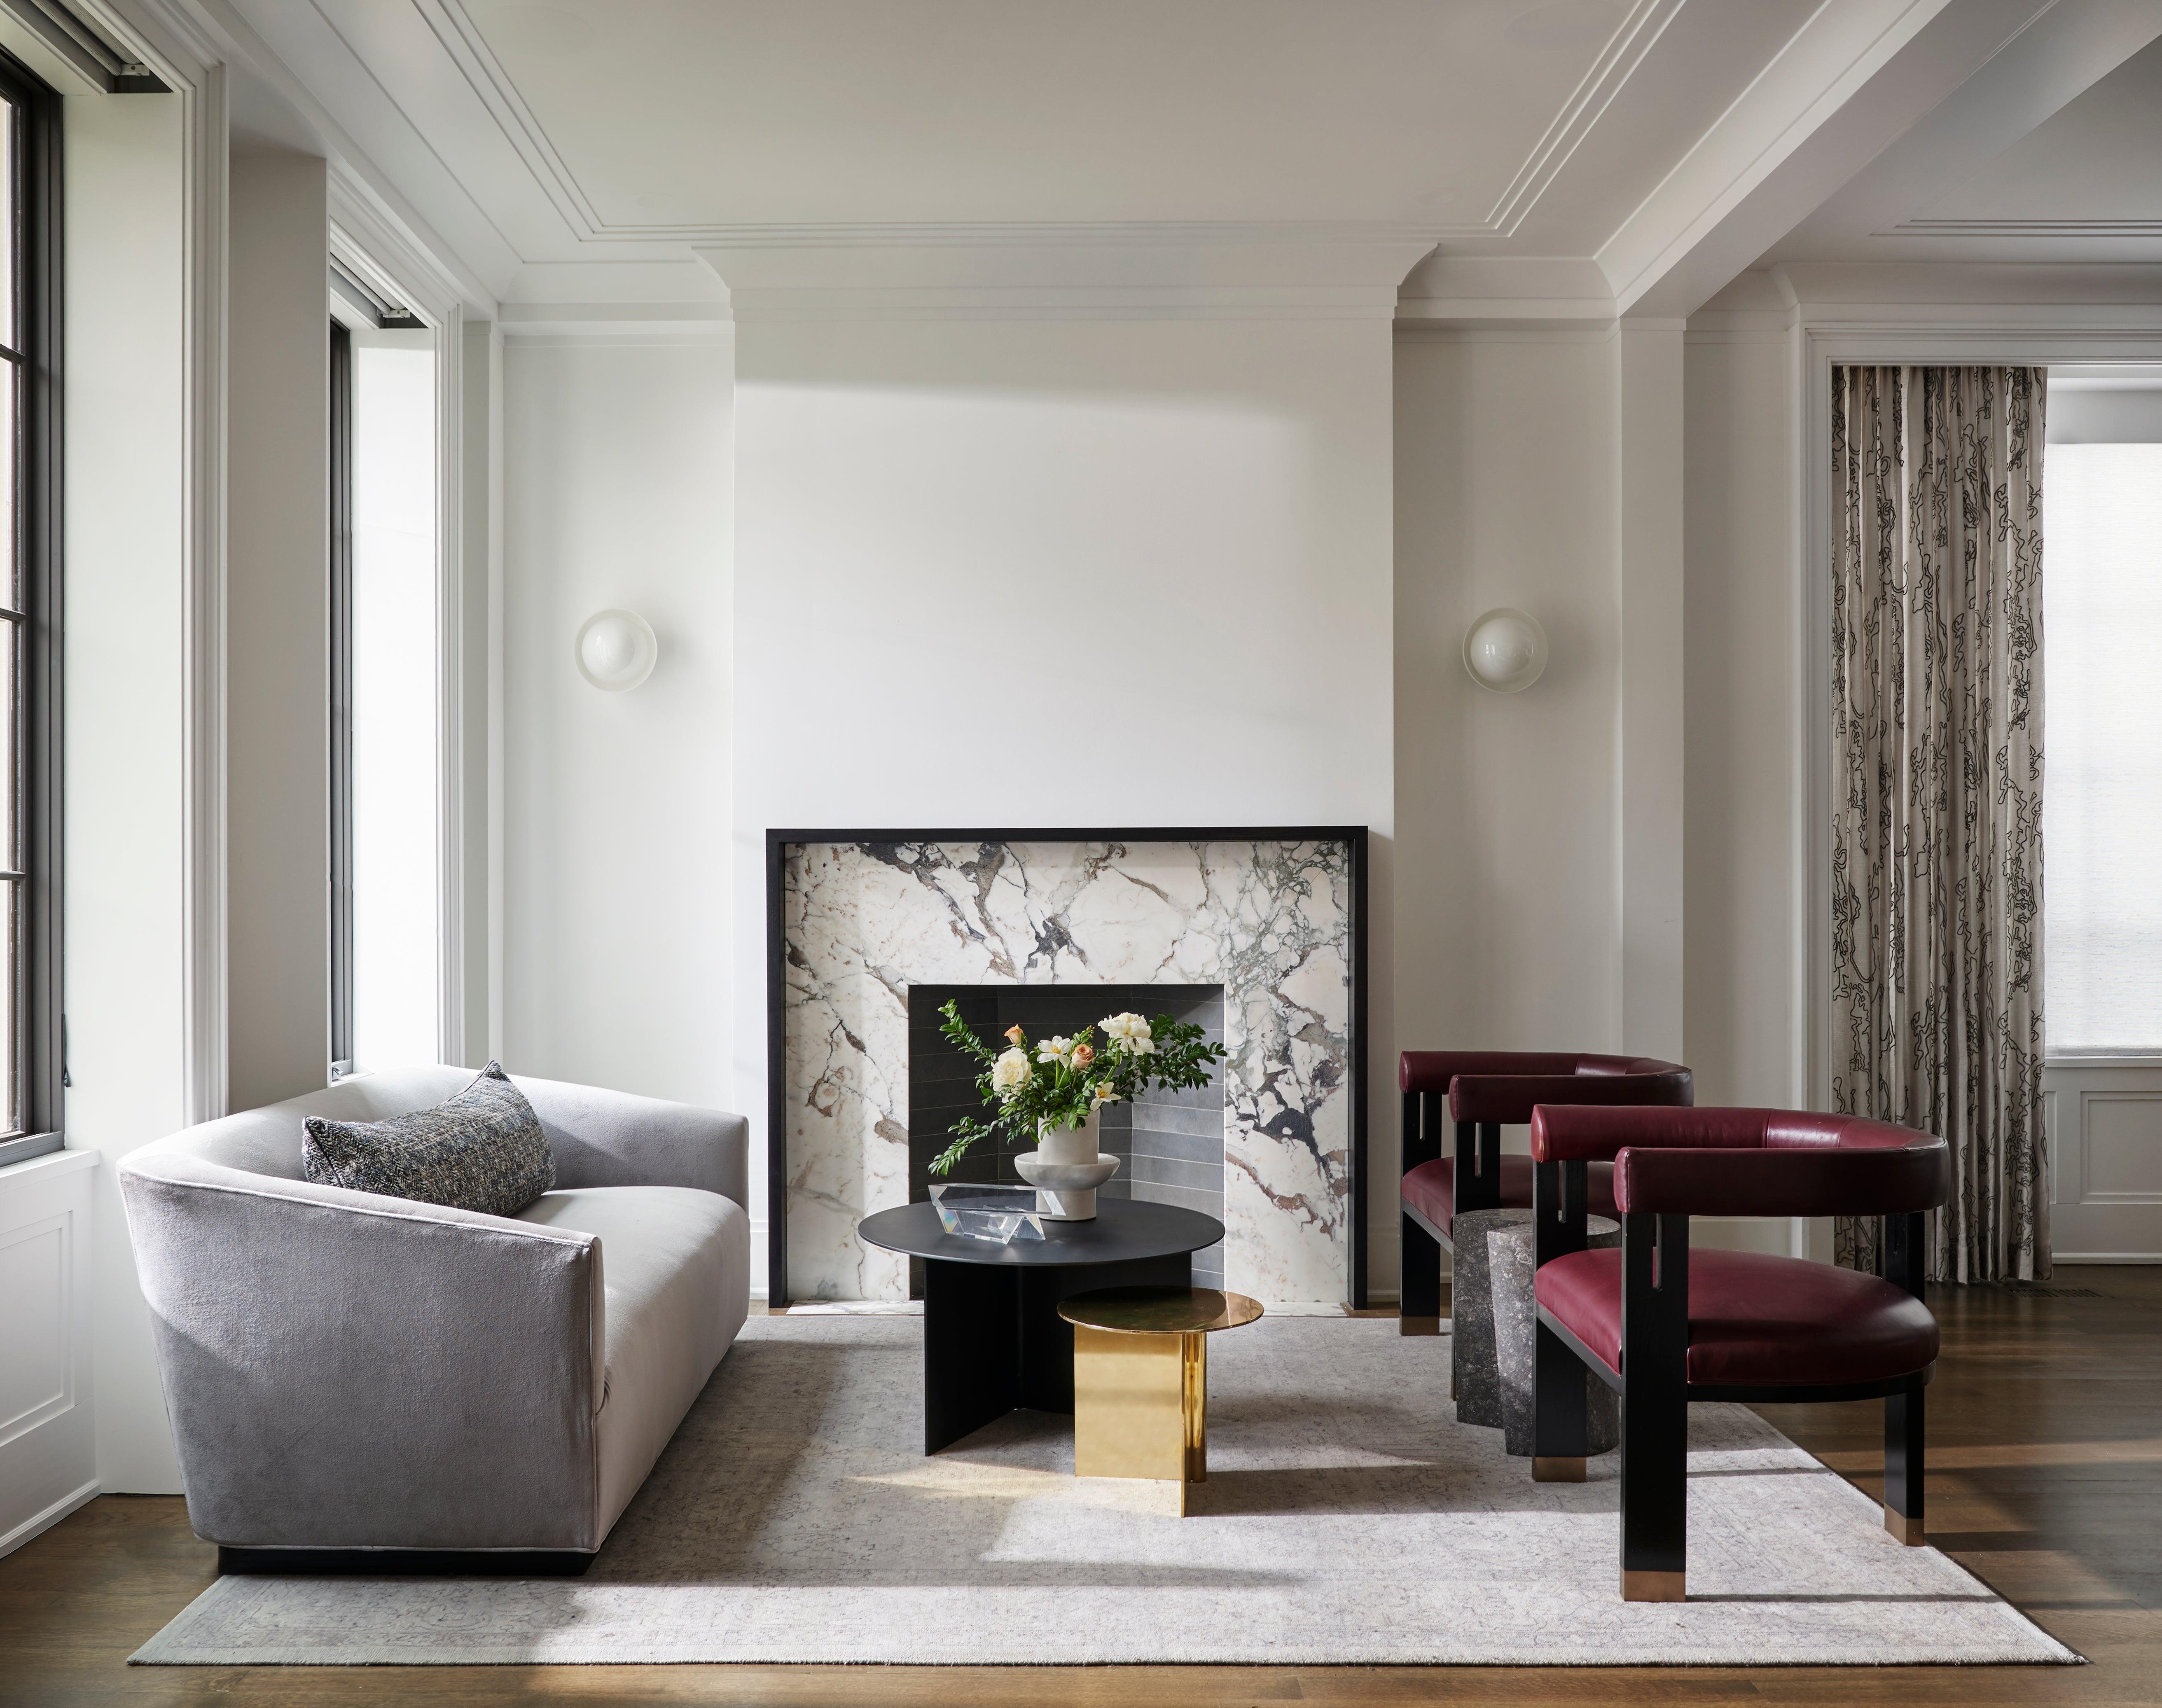 Tour A Modern Chicago Home Following a Gut Reno by Kristen Ekeland of Studio Gild